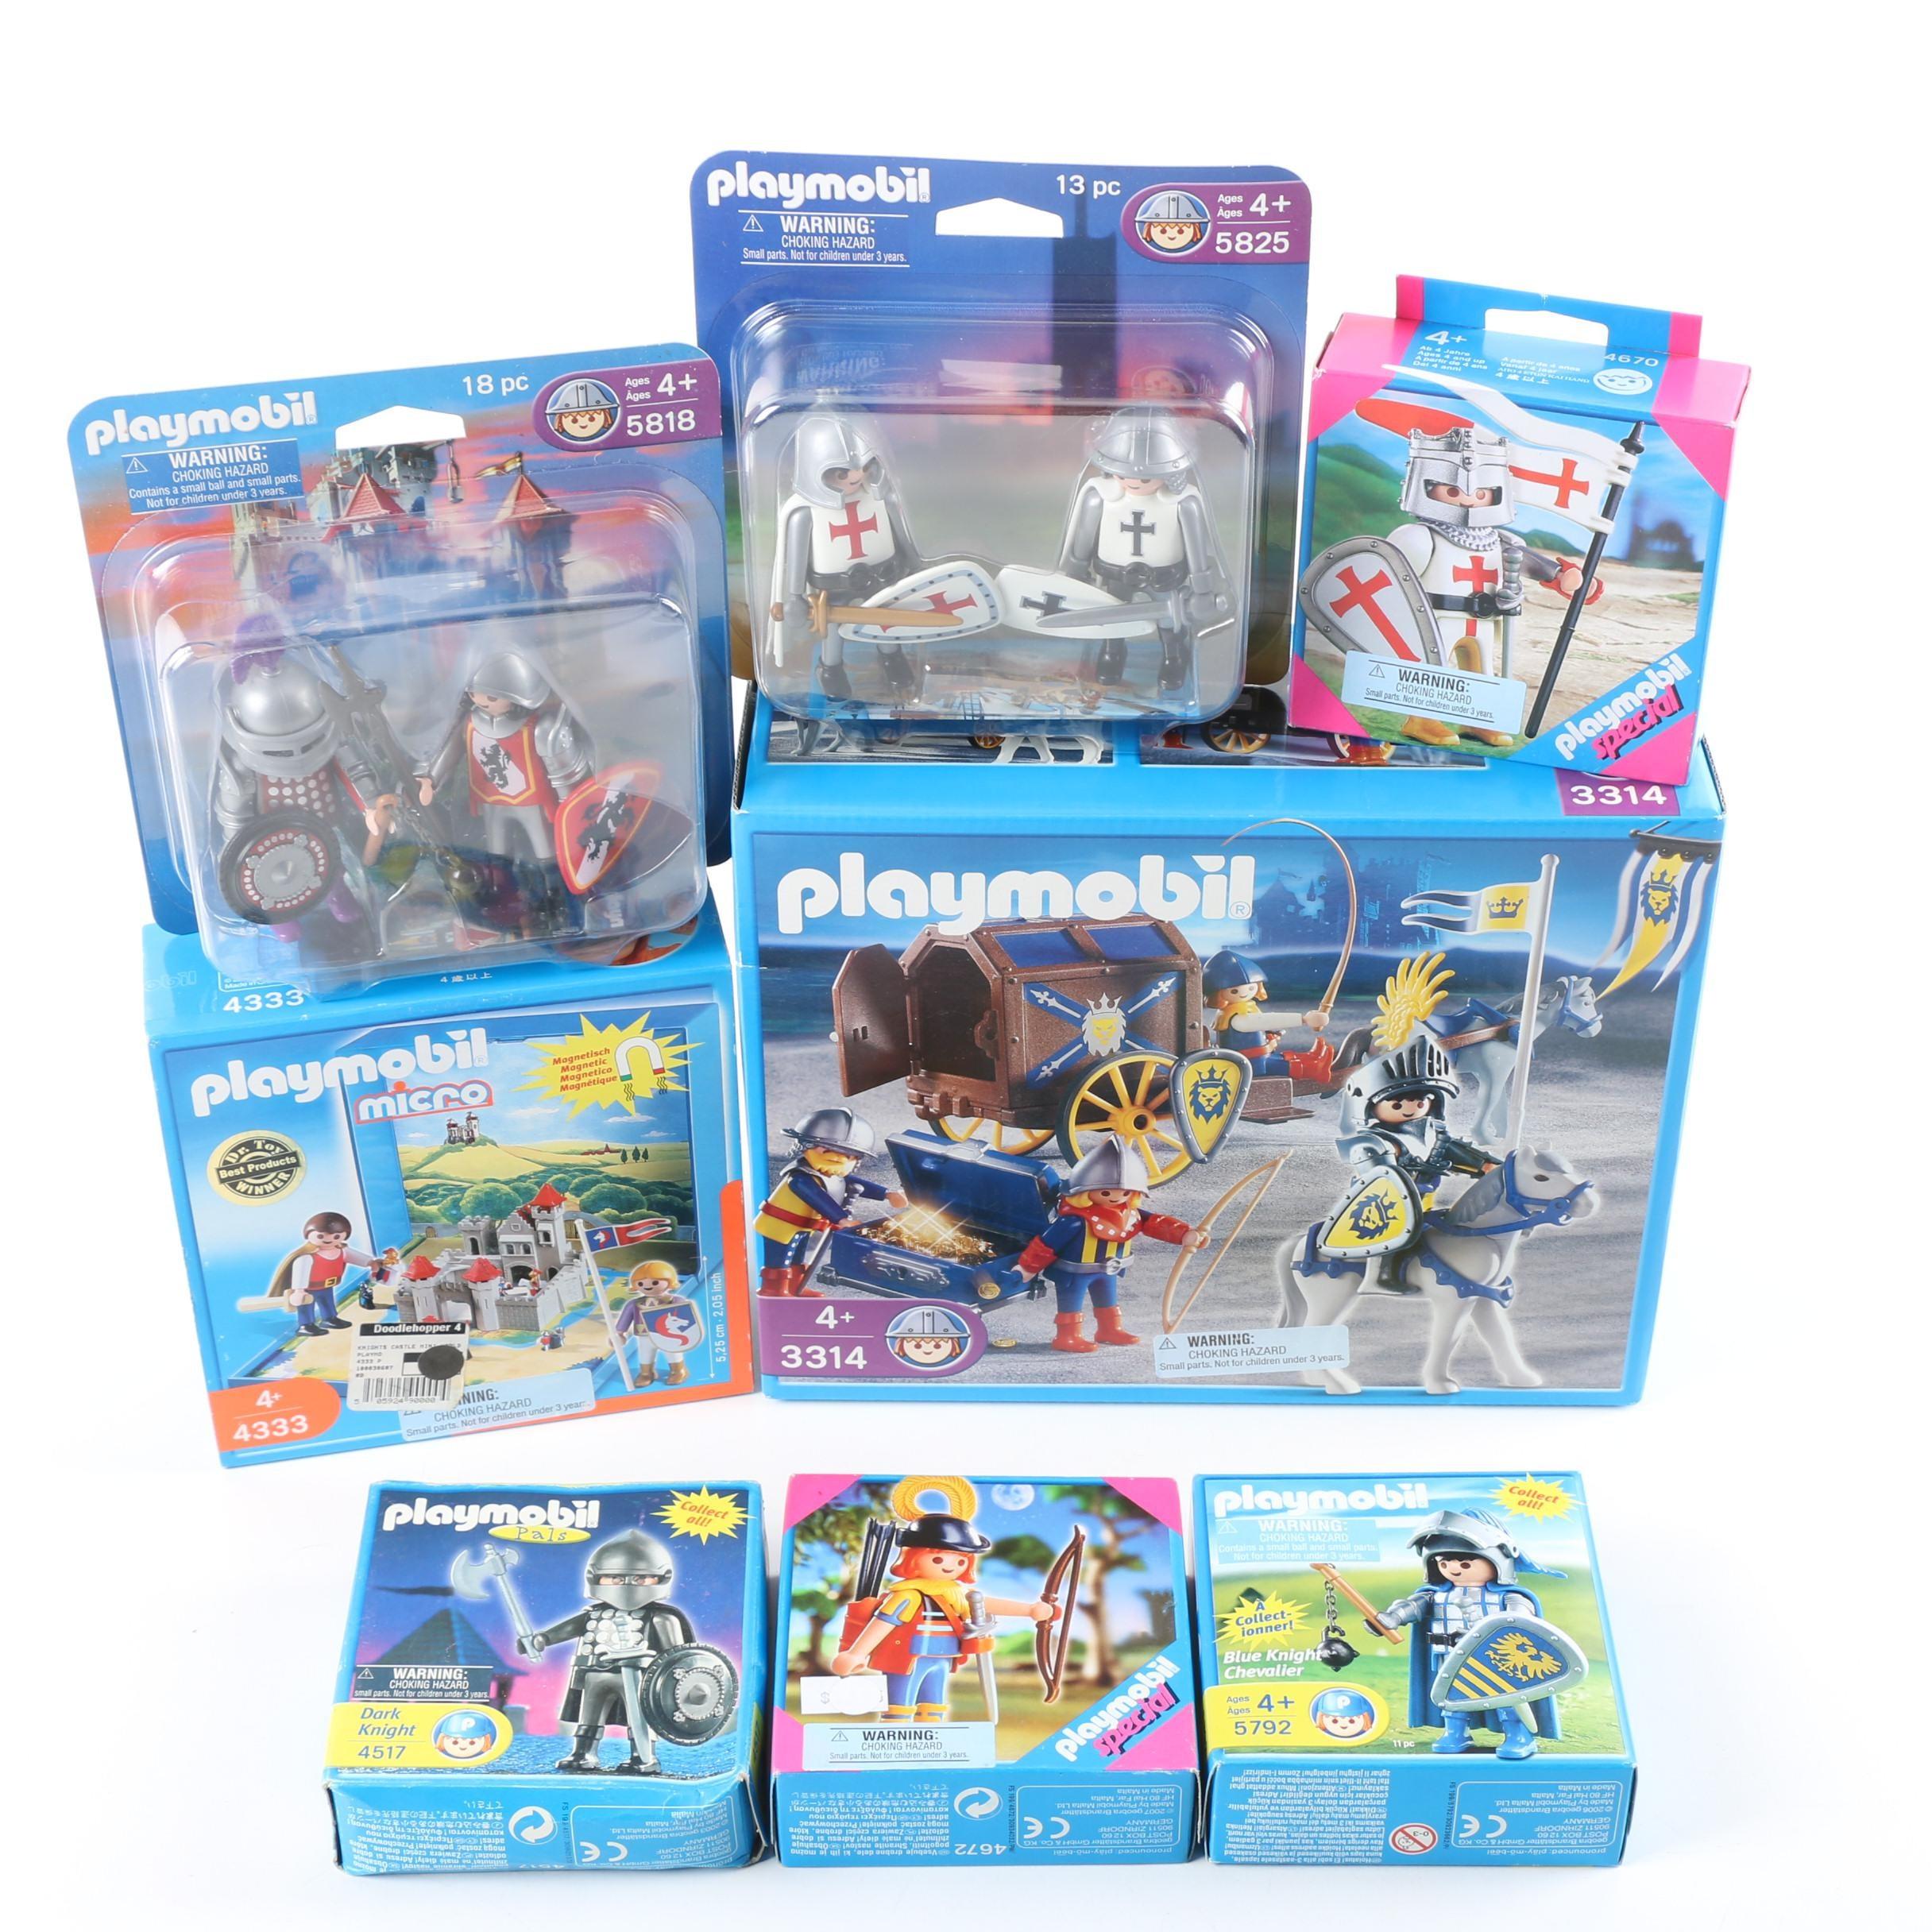 Playmobil Knight-Themed Play Sets